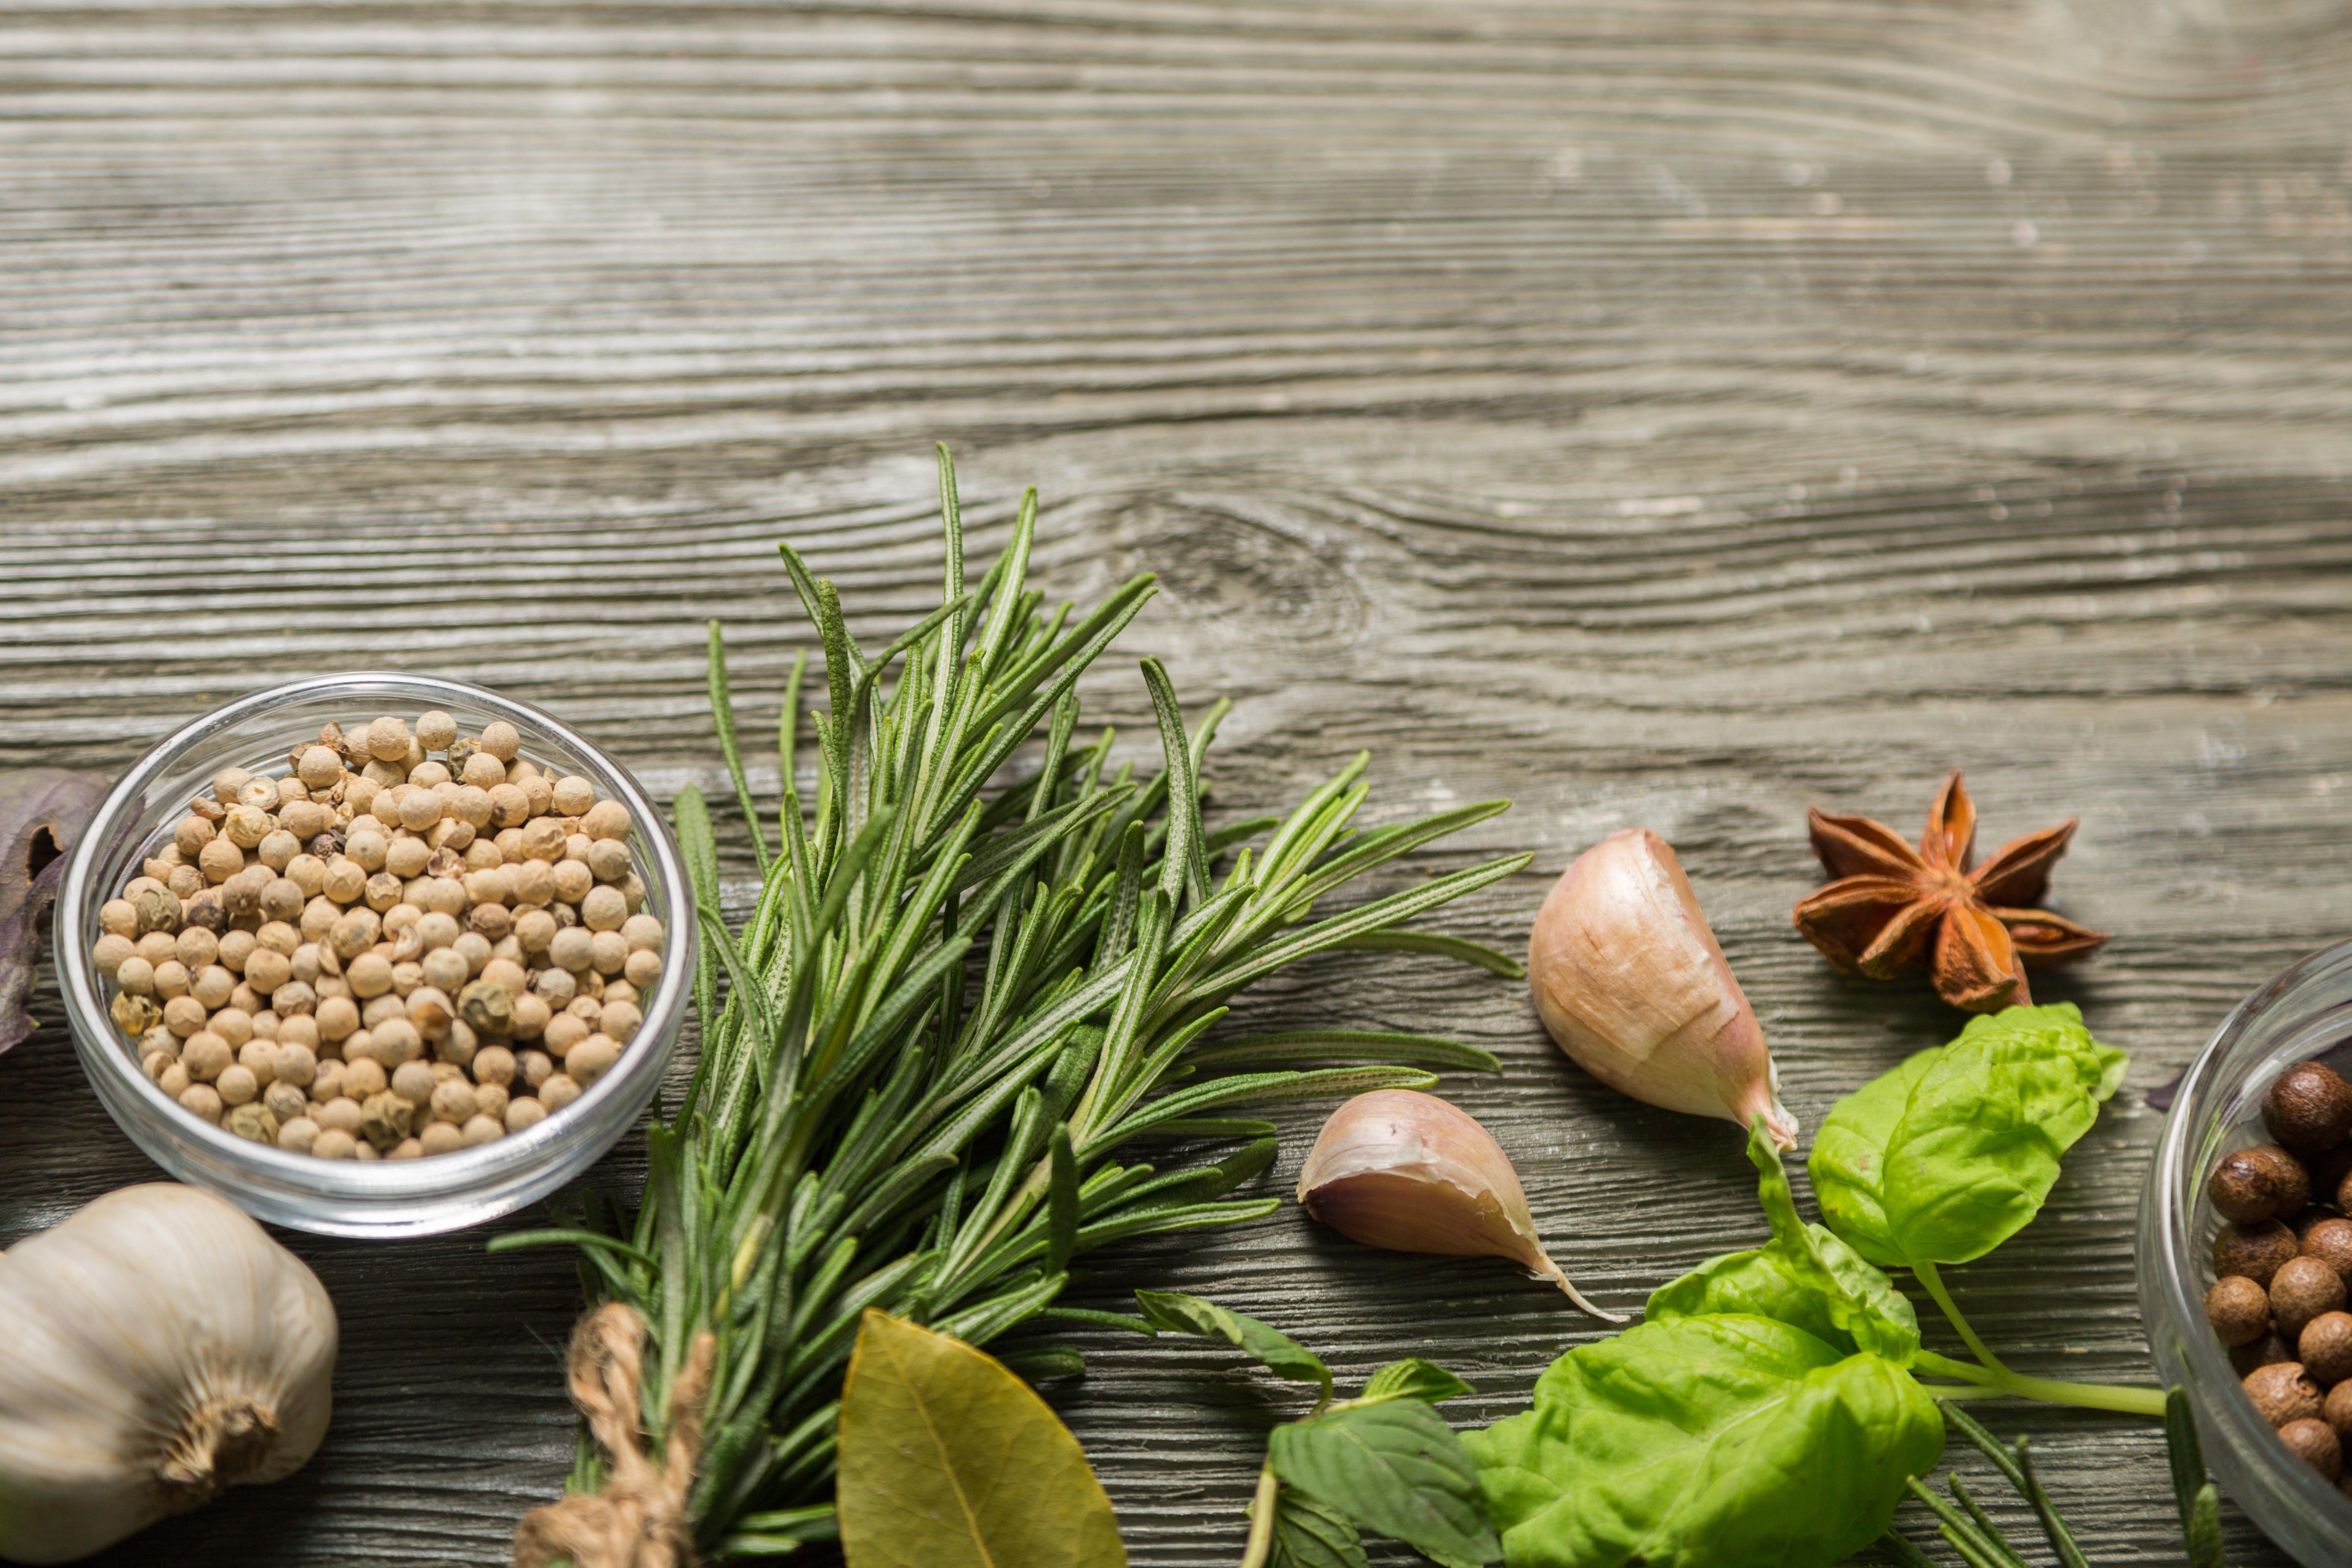 Italian Spices and Herbs, Italian Garden, Italian Herb Garden, Growing Garlic, Growing Basil, Growing Parsley